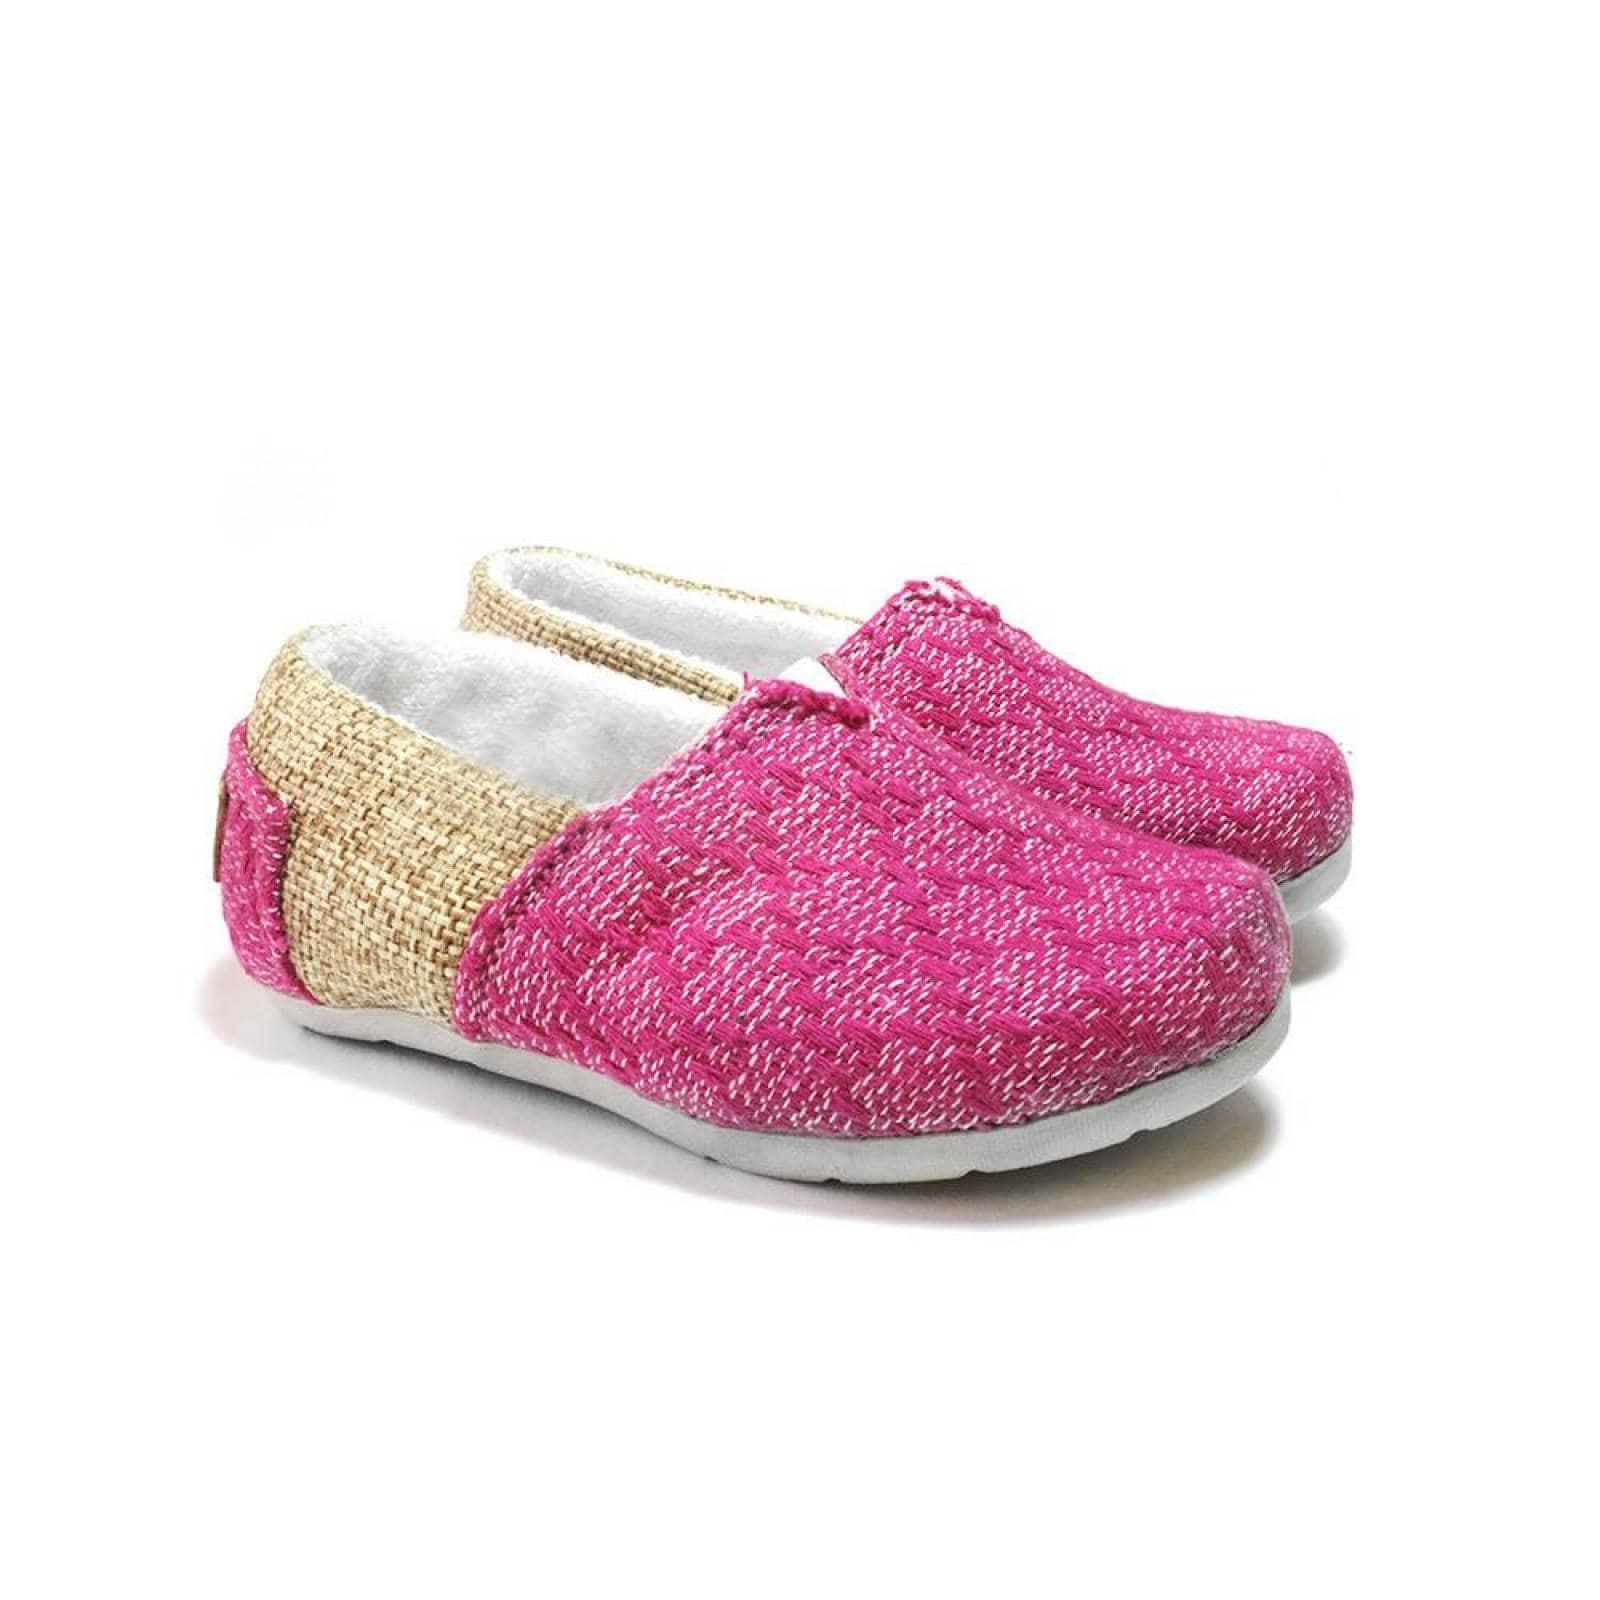 Zapato Alpargata Mini Jacinta Artesanal Tela Infantil Coral Komoni Talla: 20